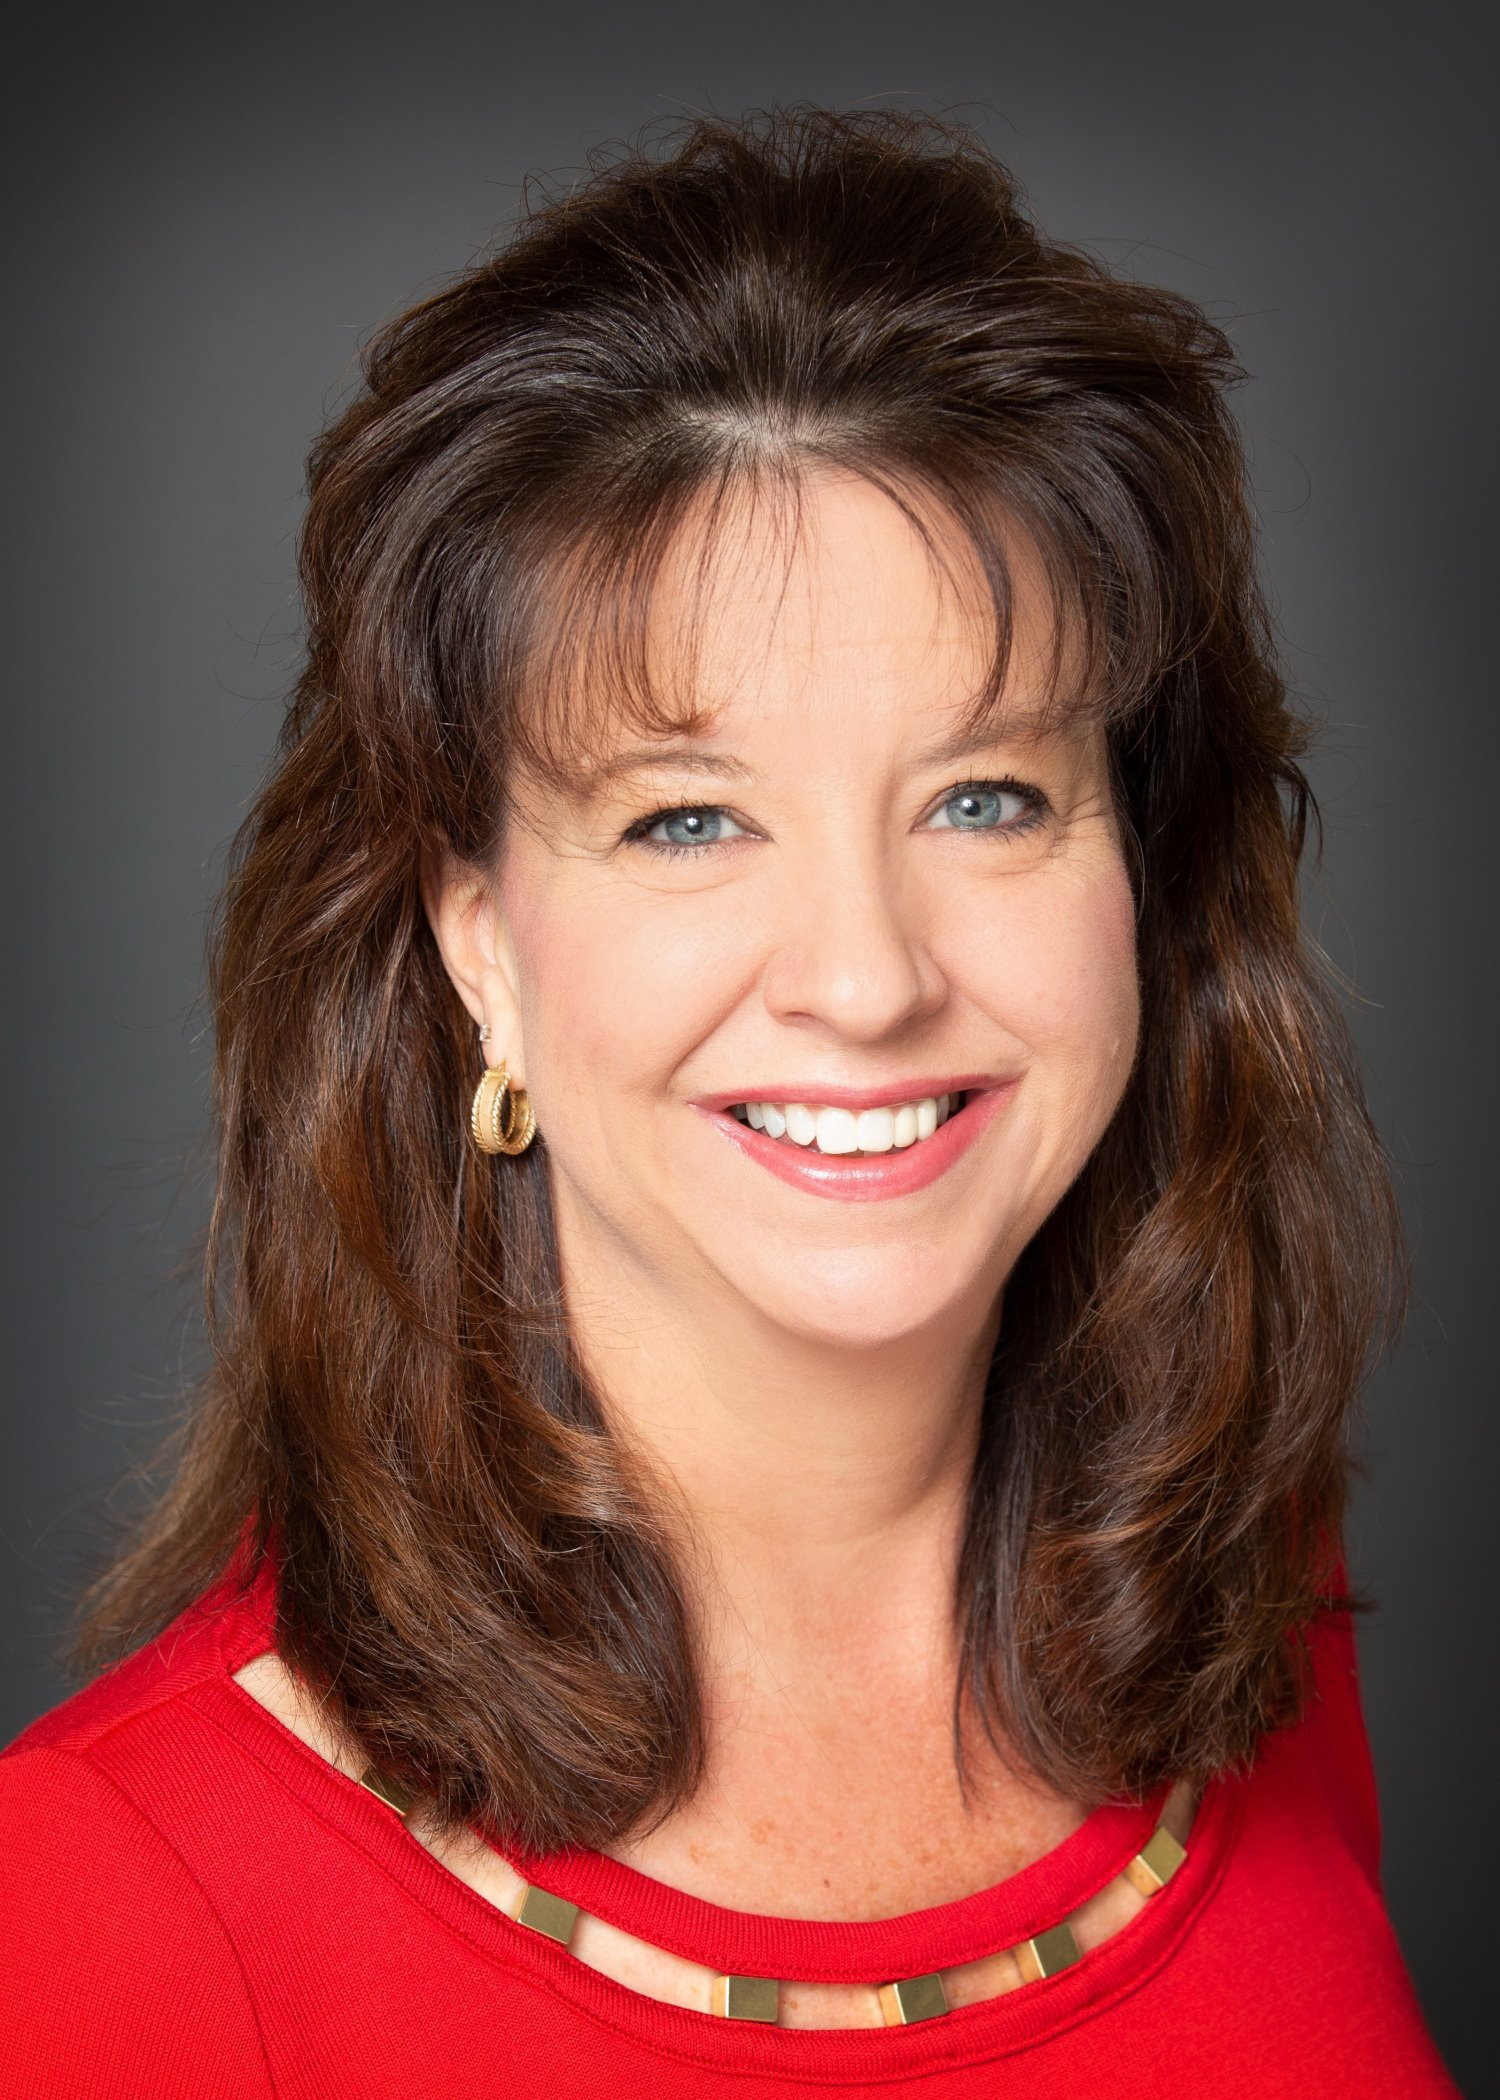 Kristi Headshot